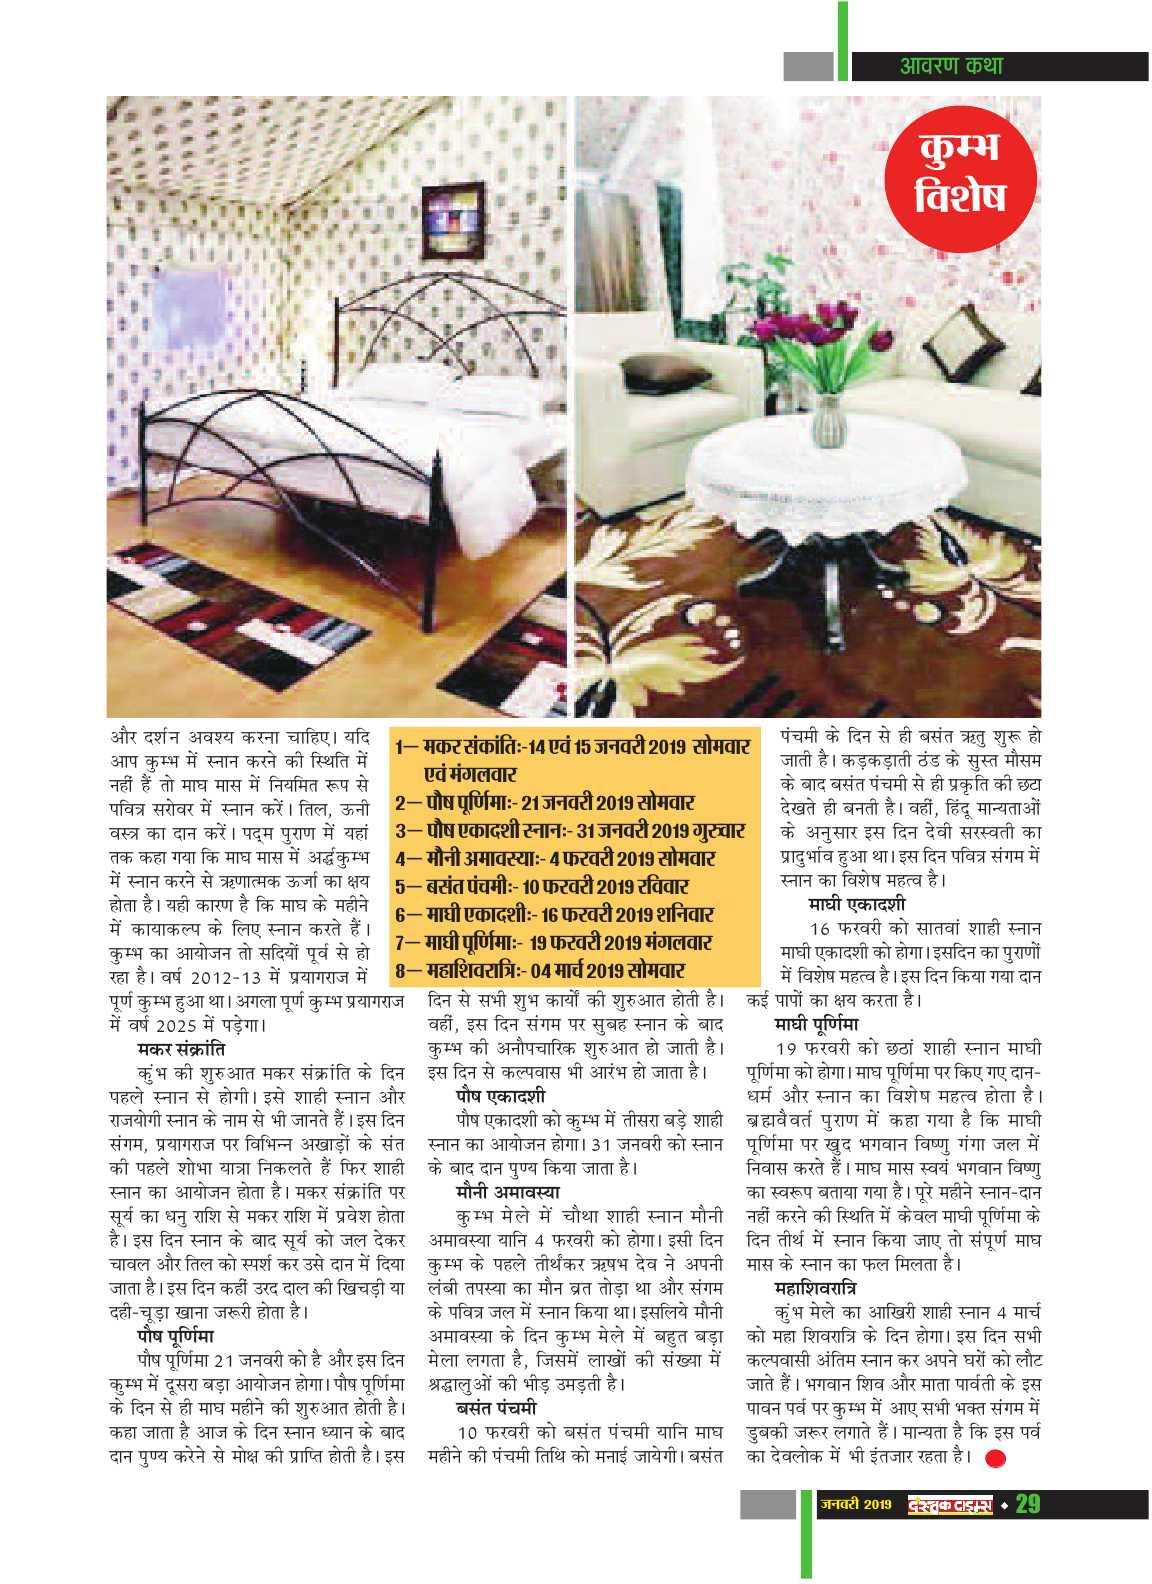 Dastak Times for E-Magazine 15 Jan 2019 new31